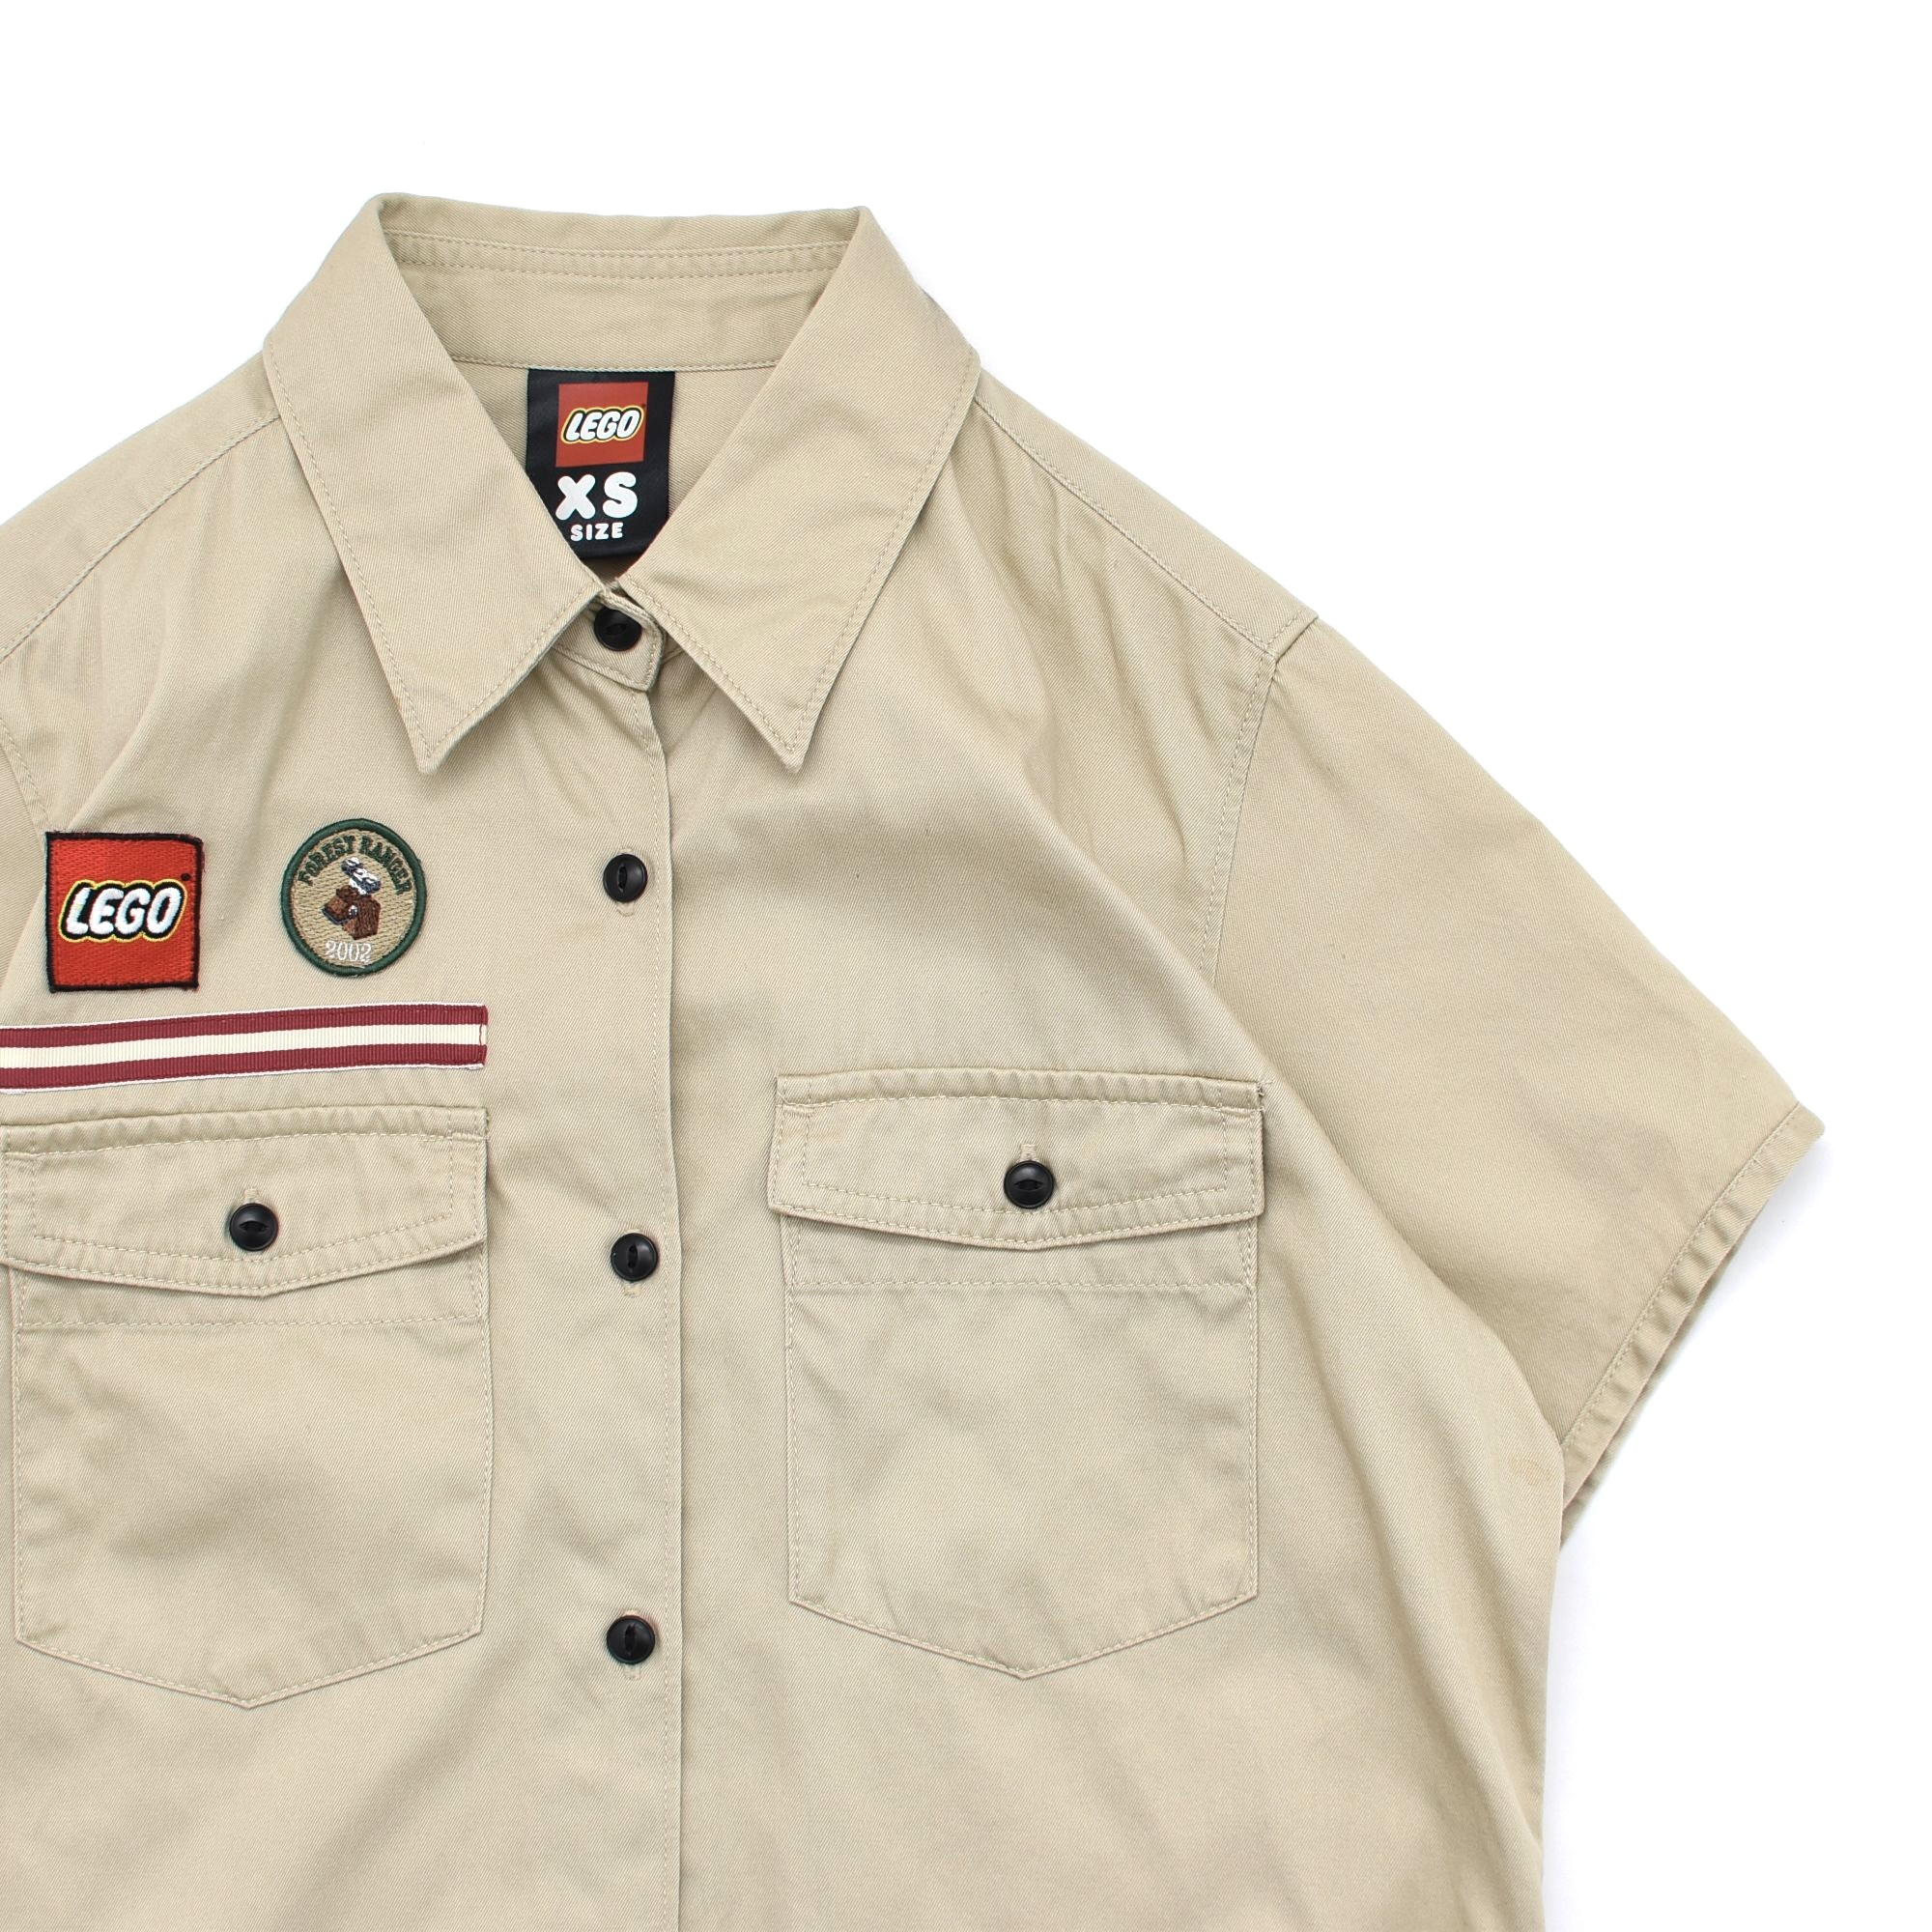 LEGO official twill work shirt